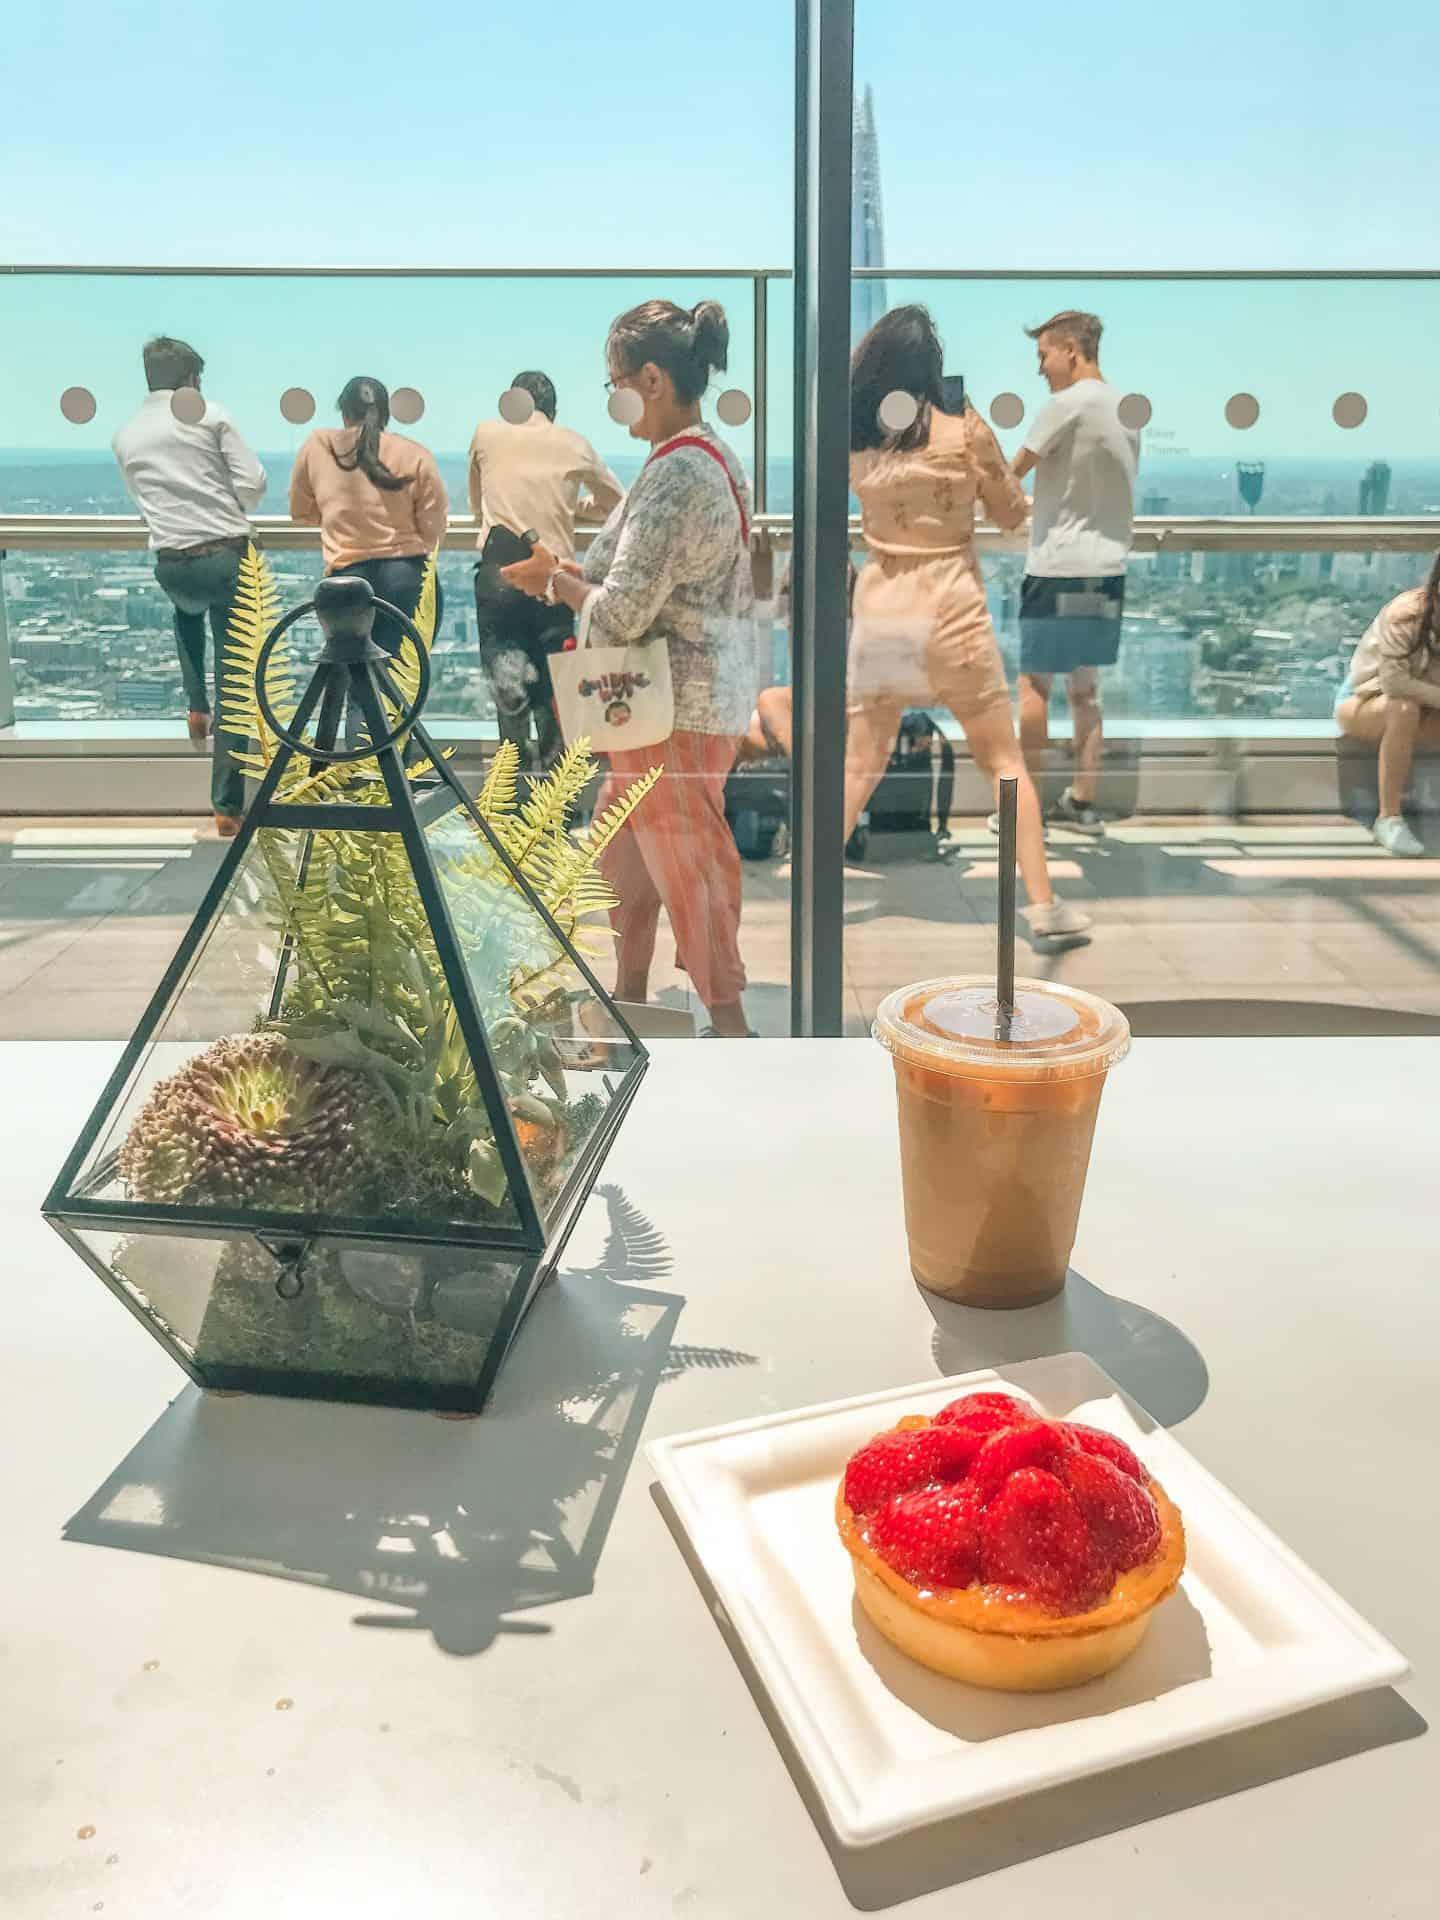 Food in the Skygarden